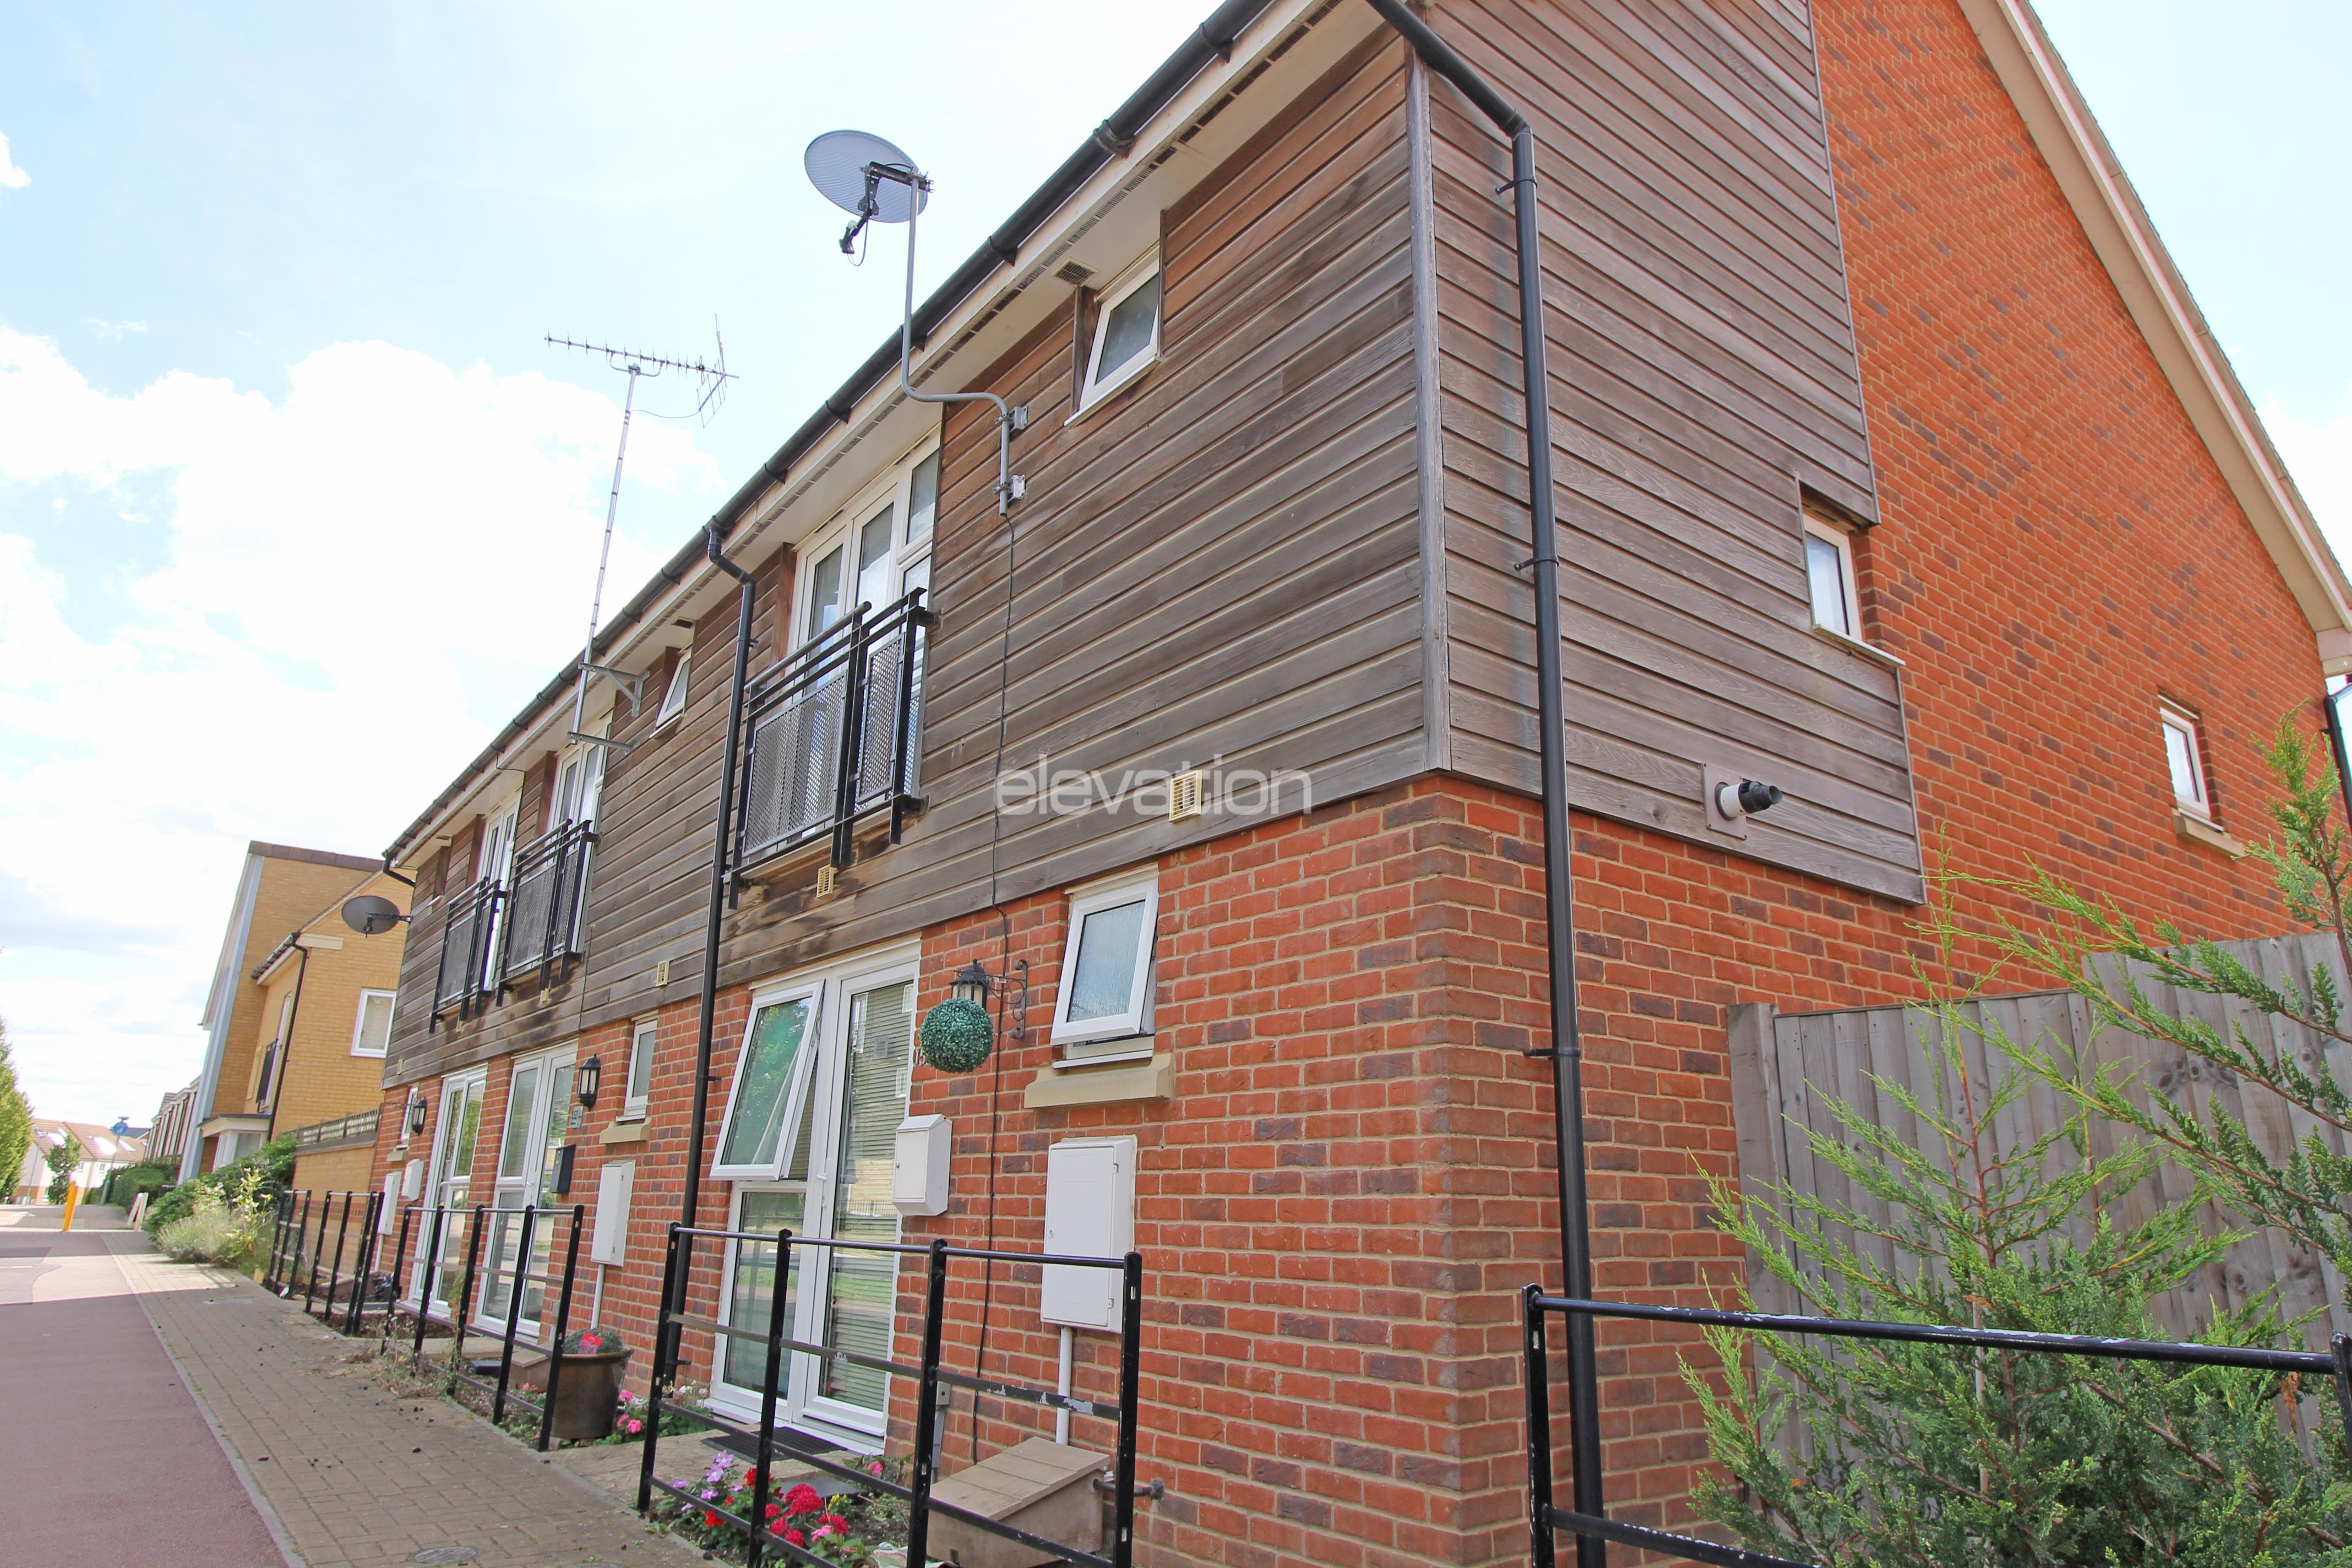 Warwick Avenue, Milton Keynes, Buckinghamshire Image